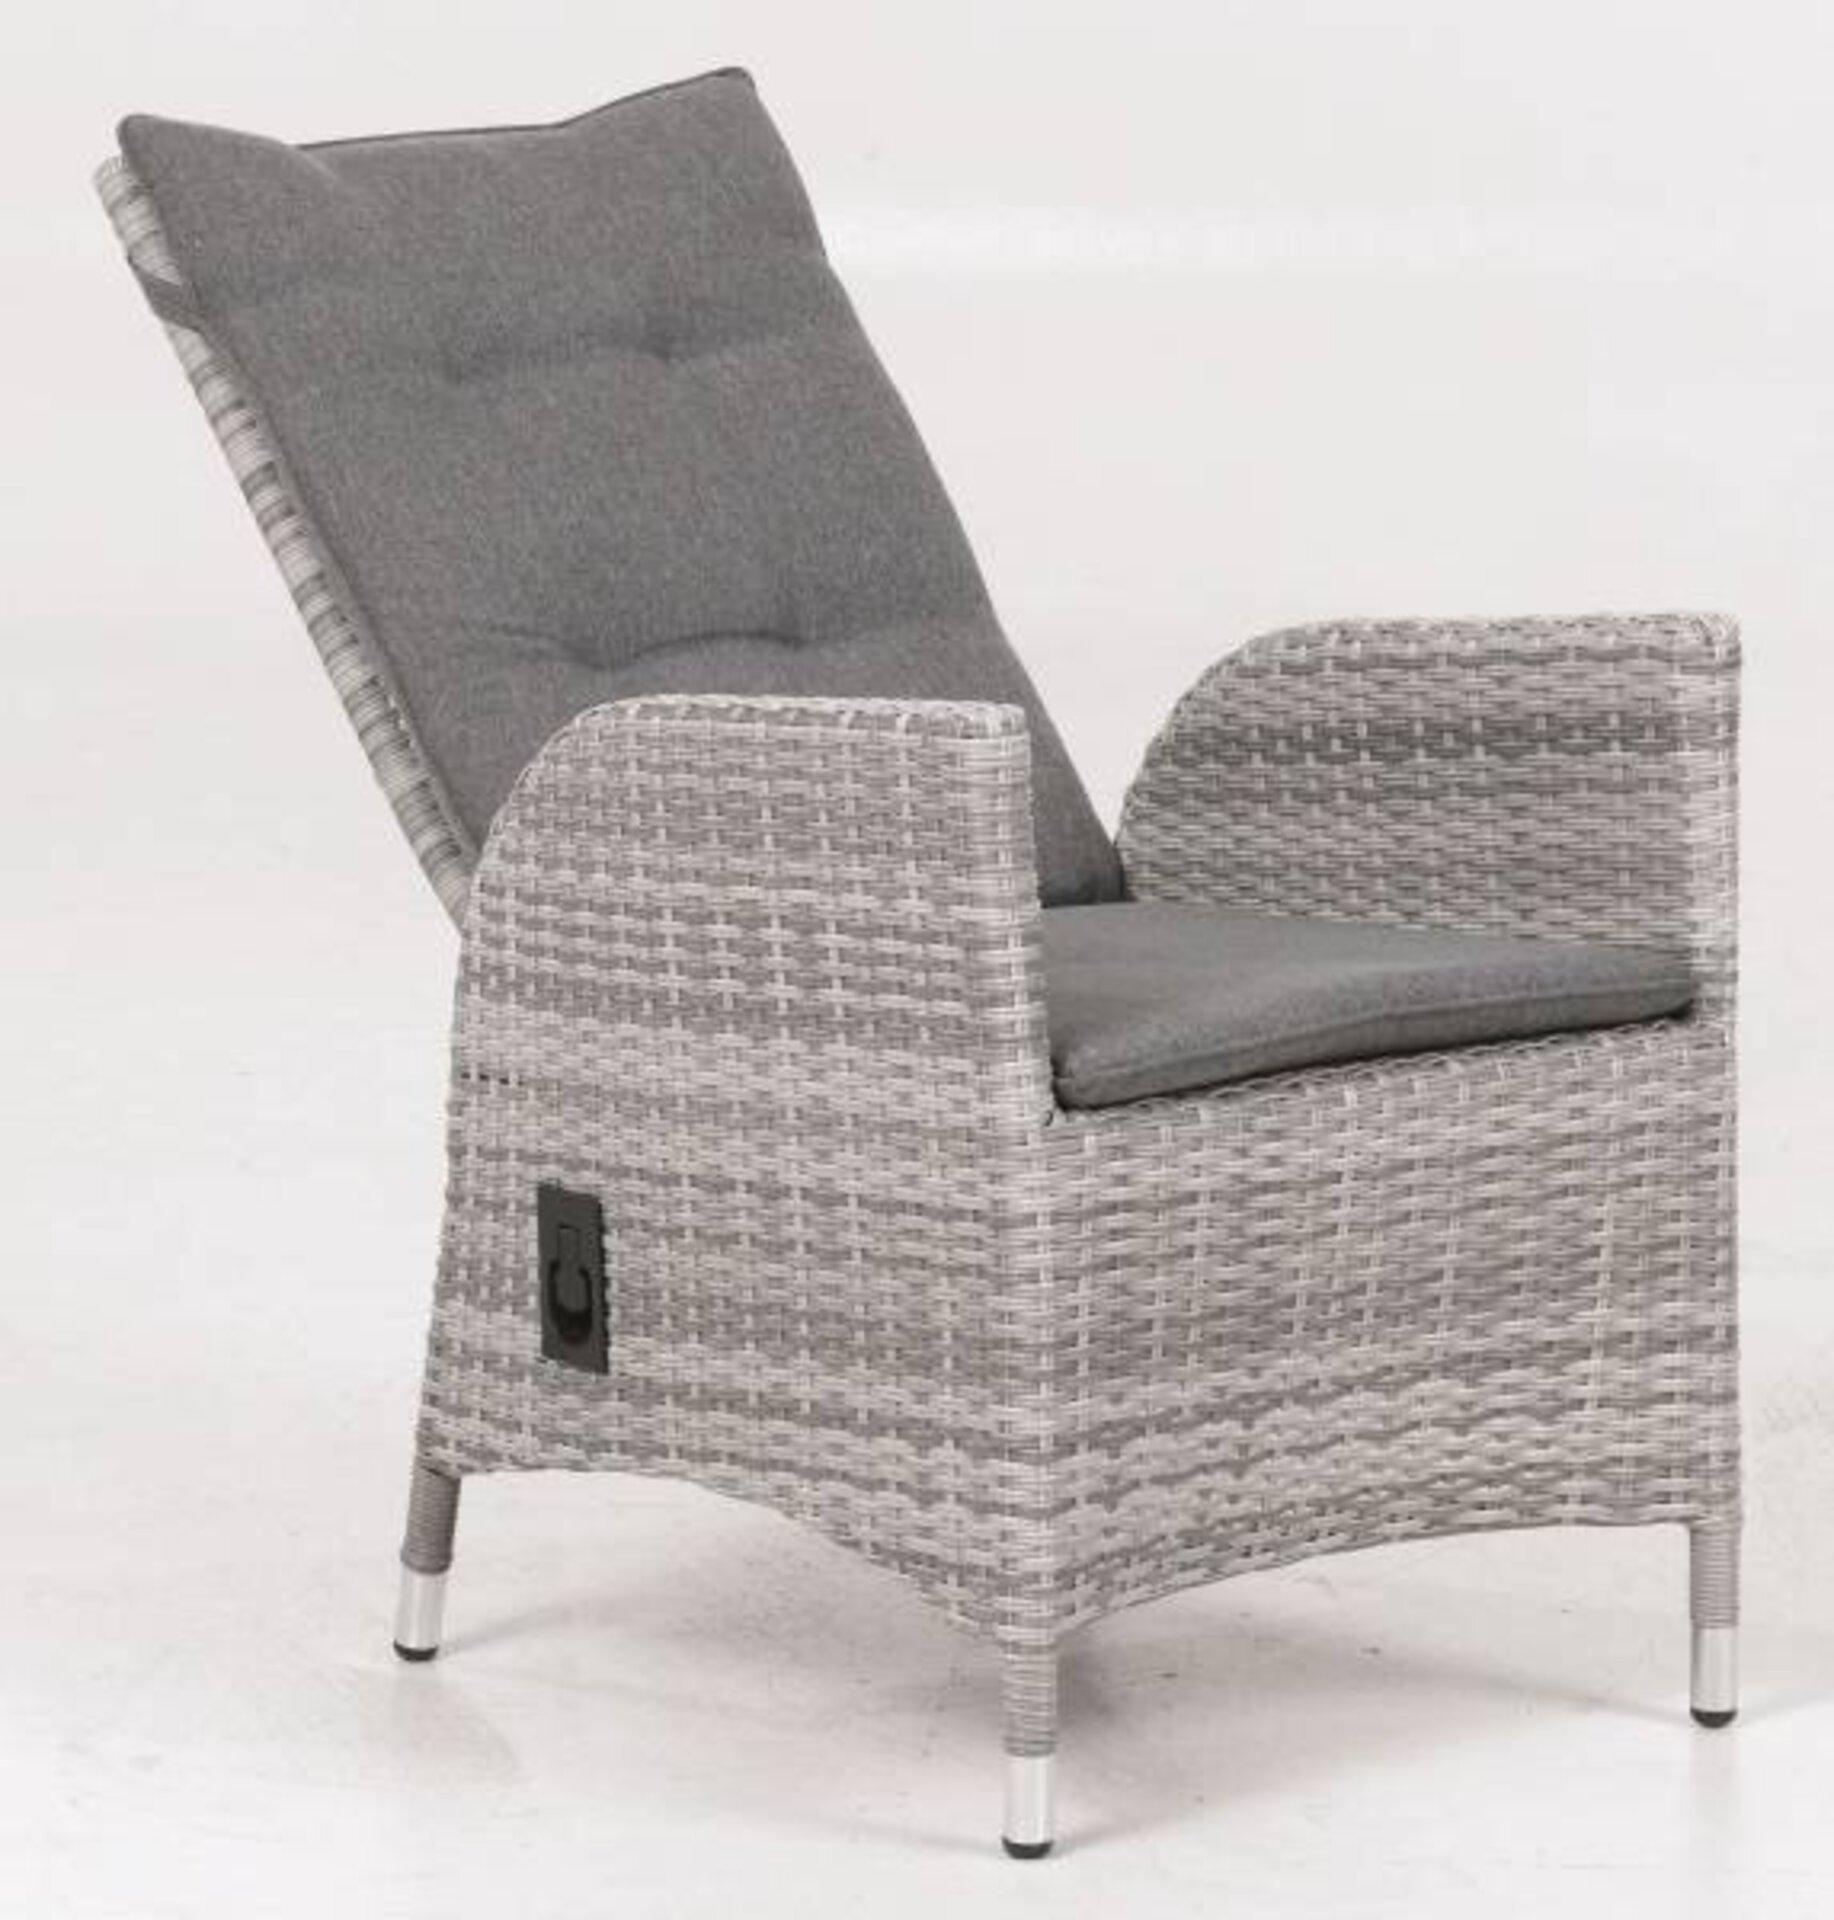 Gartenstuhl Parma Outdoor Textil grau 106 x 62 x 60 cm